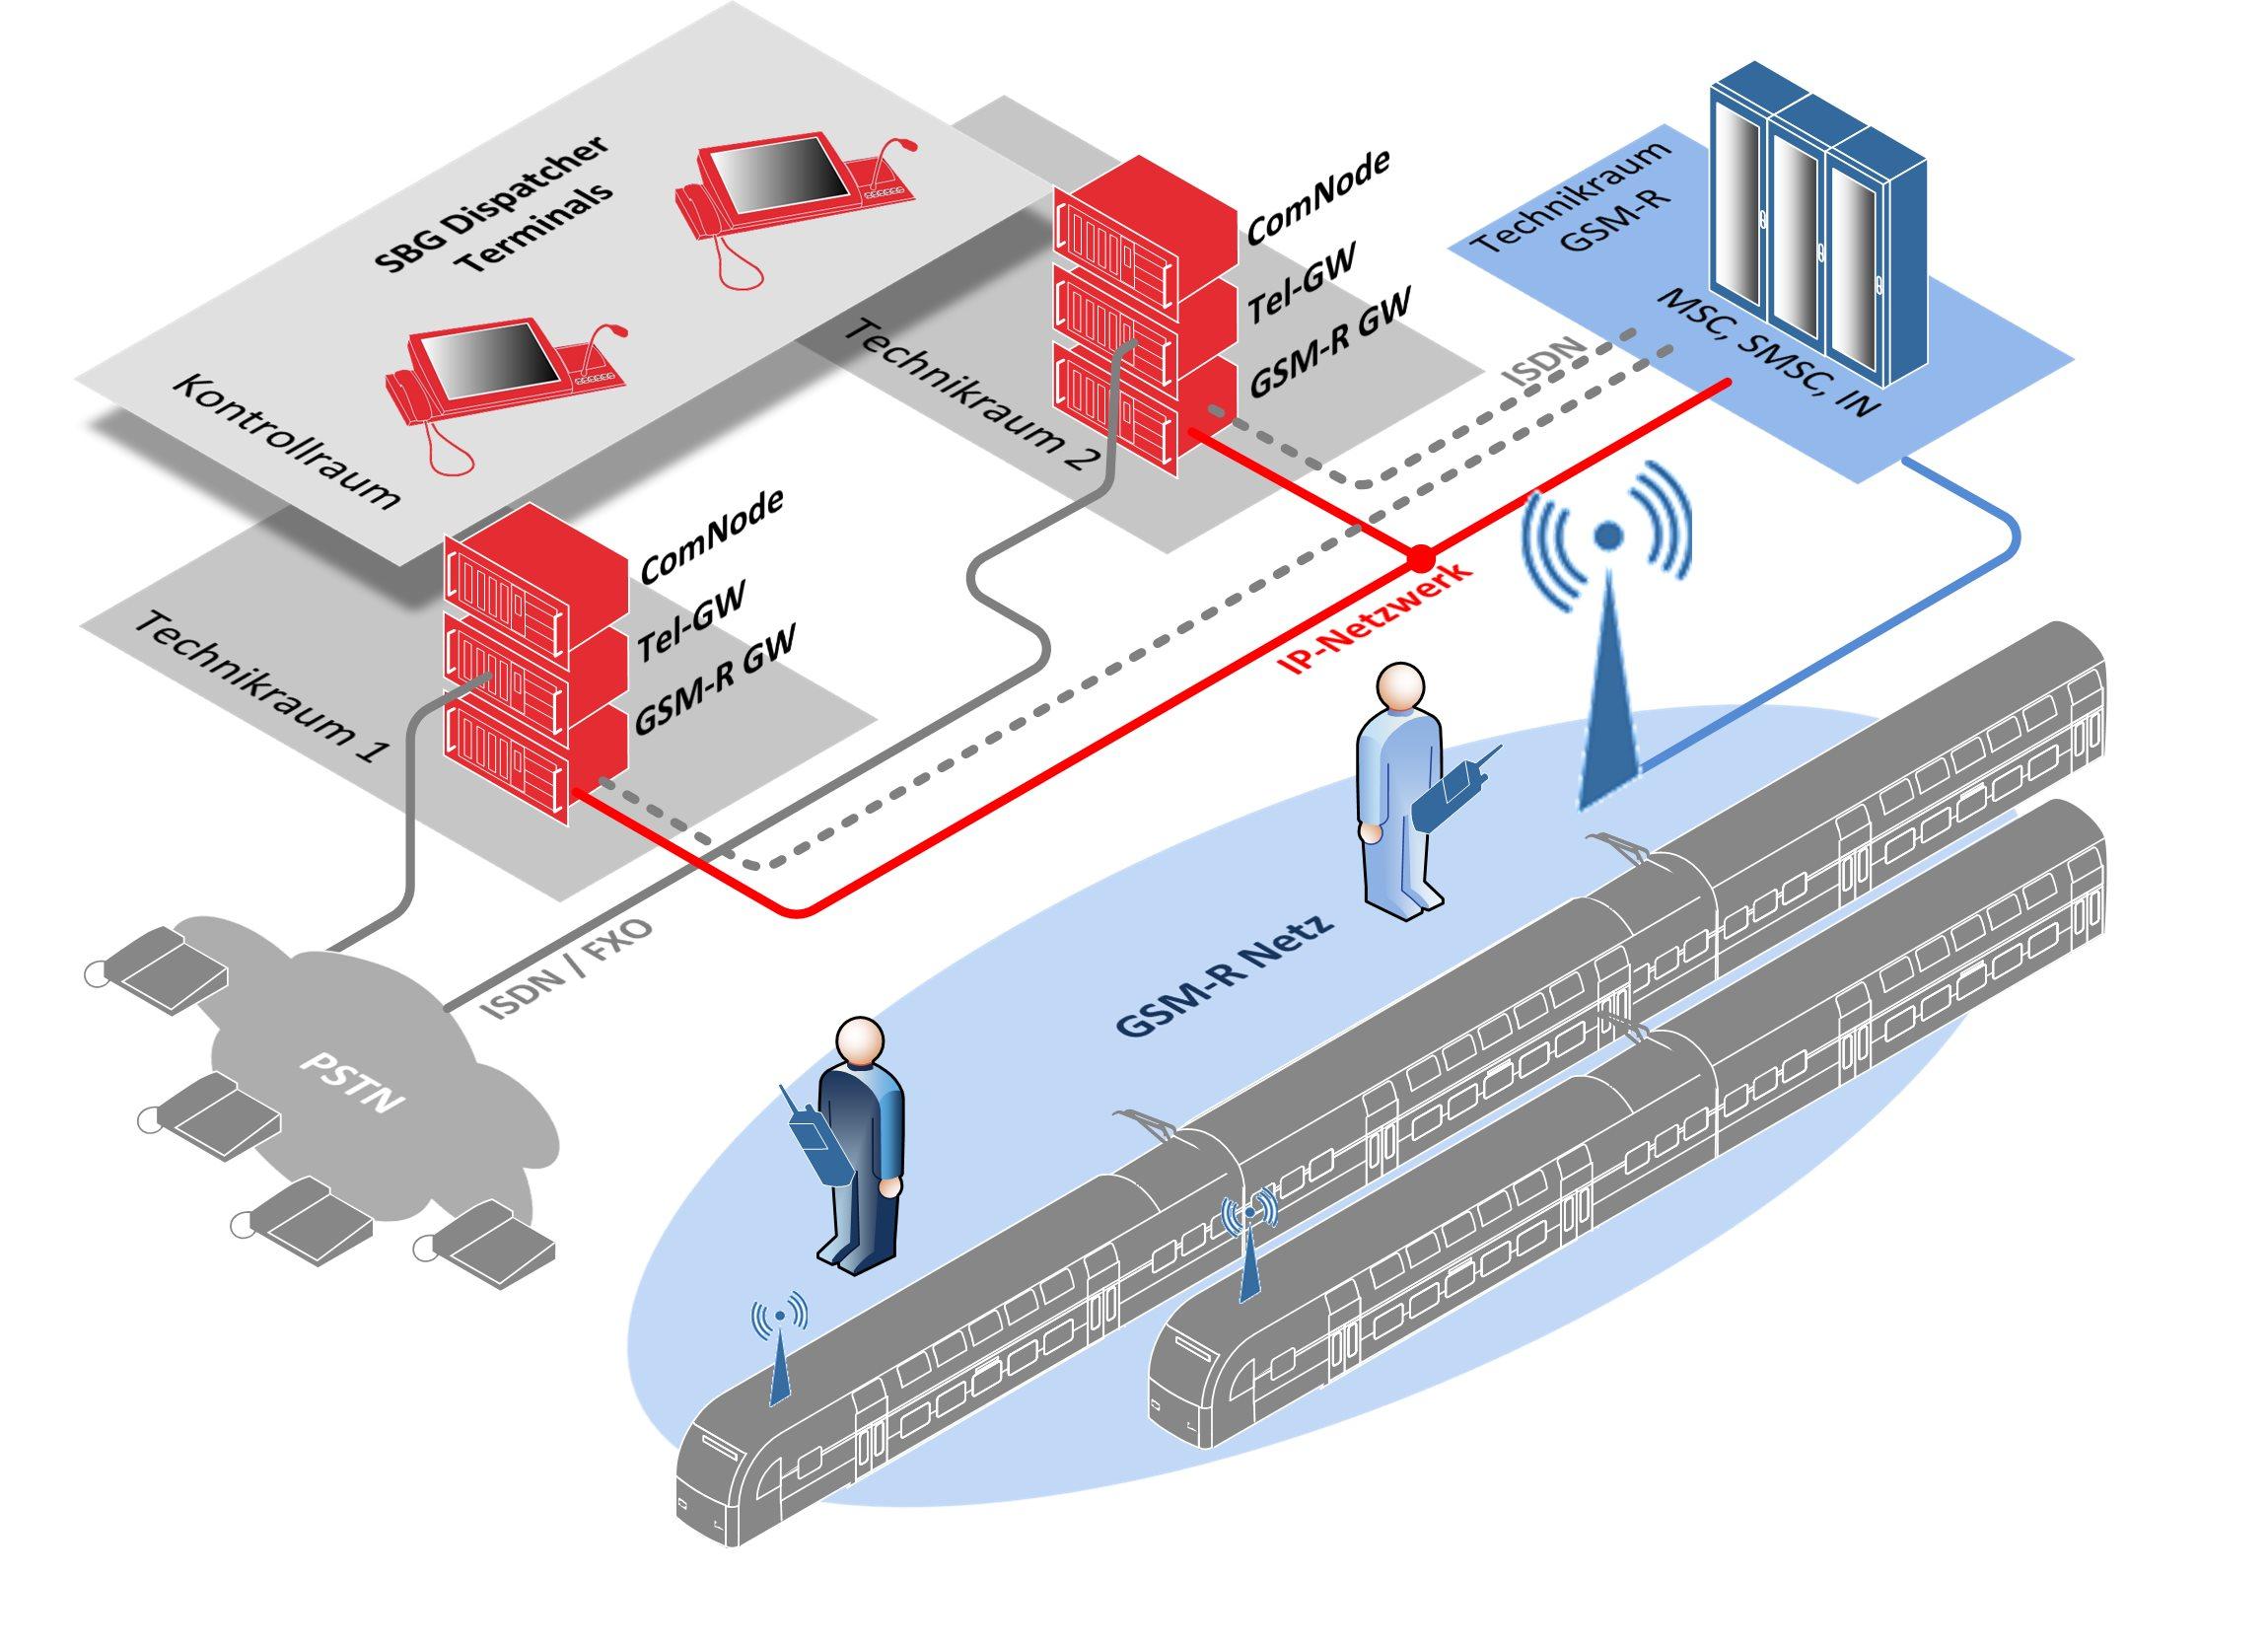 GSM-R Dispatcher System